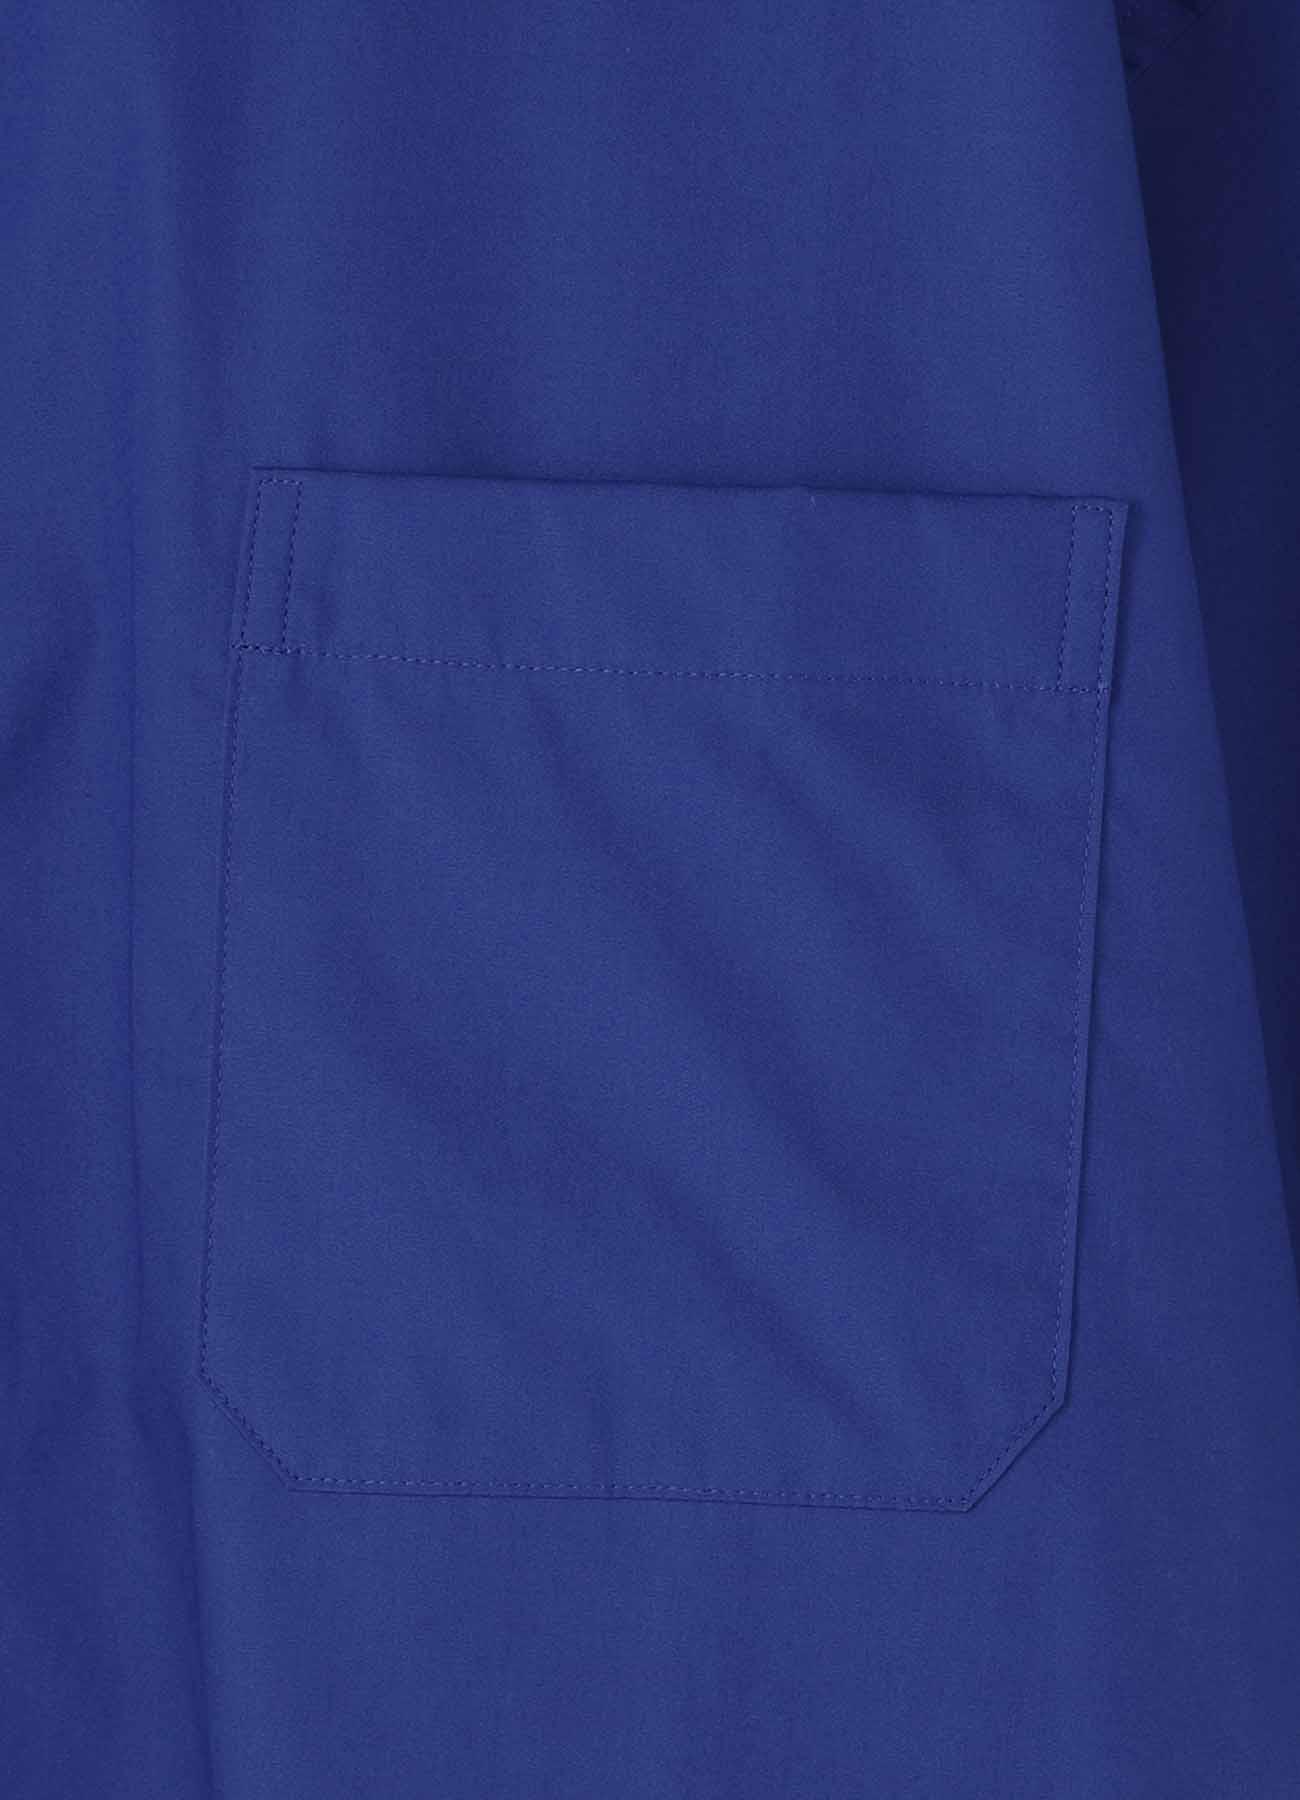 Cotton Broad Panel Bicolor Big Short Sleeve Shirt